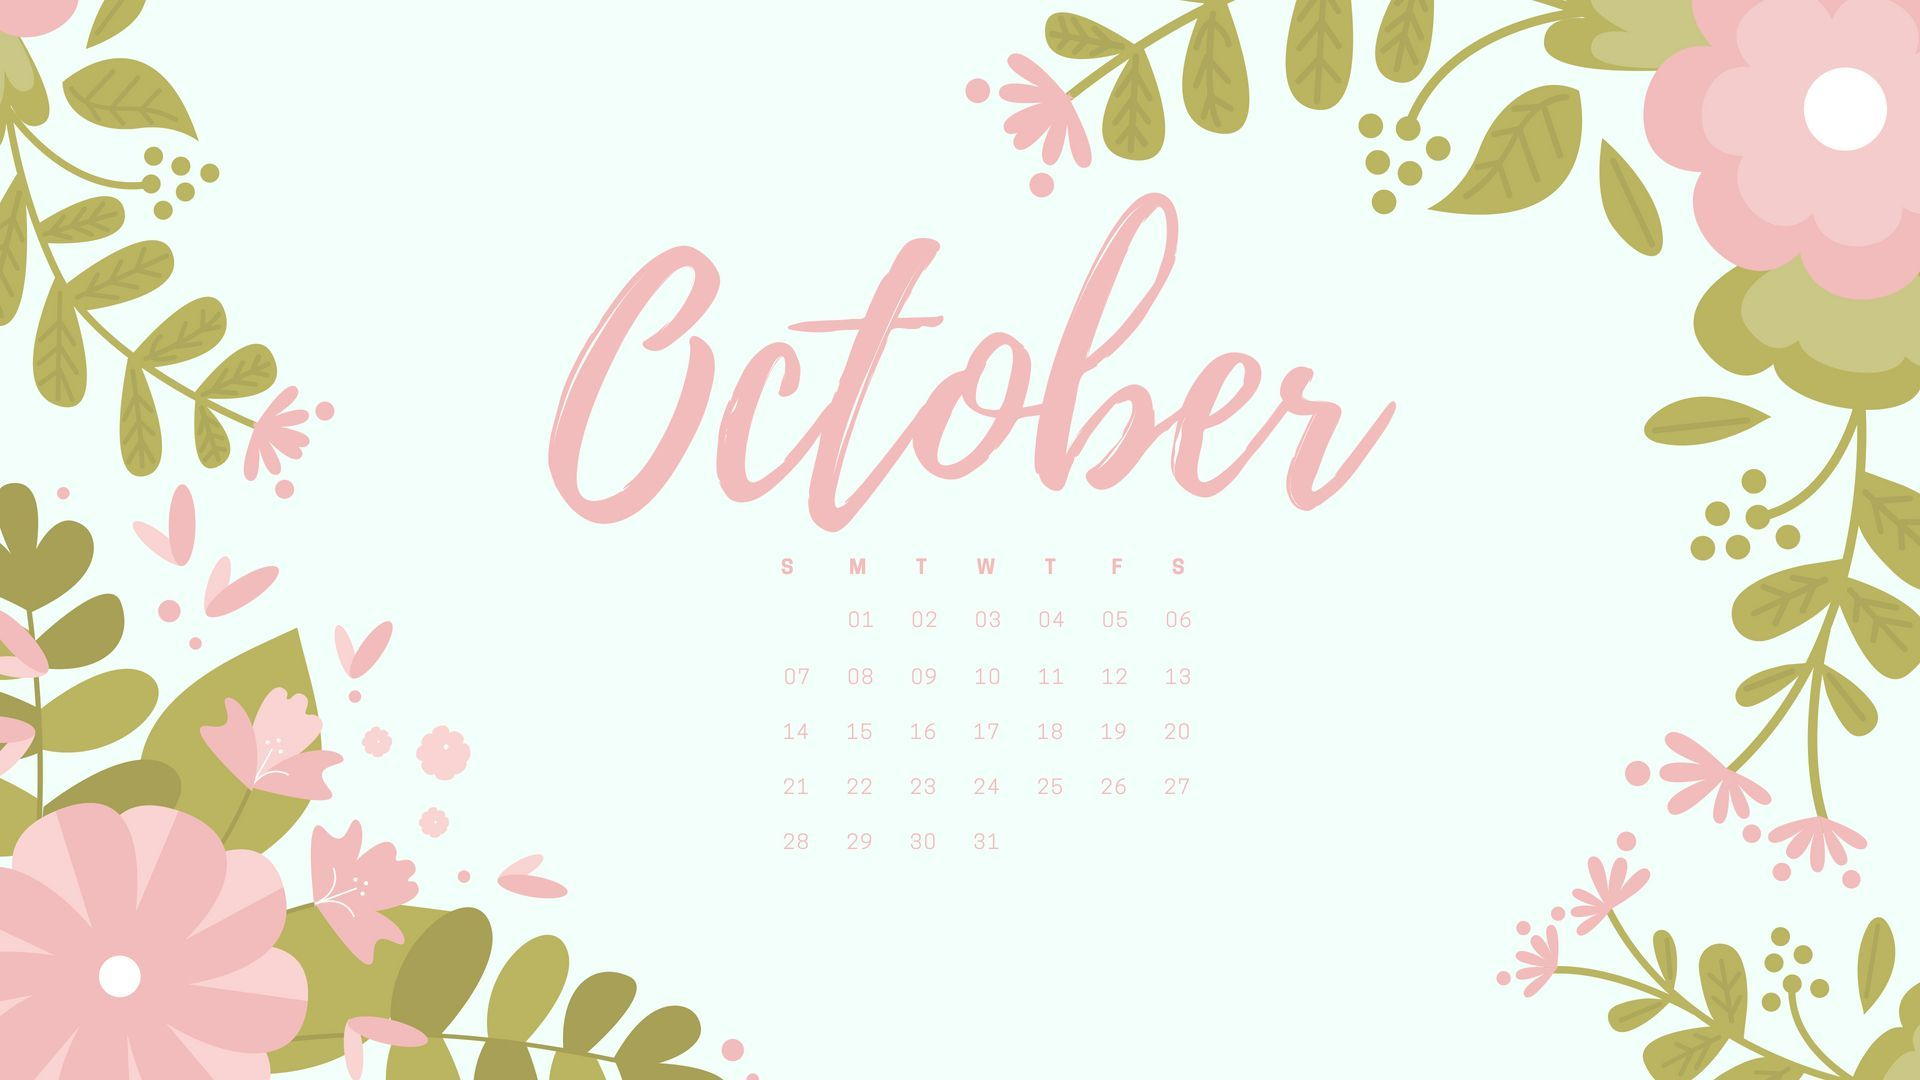 October 2018 Calendar Wallpaper